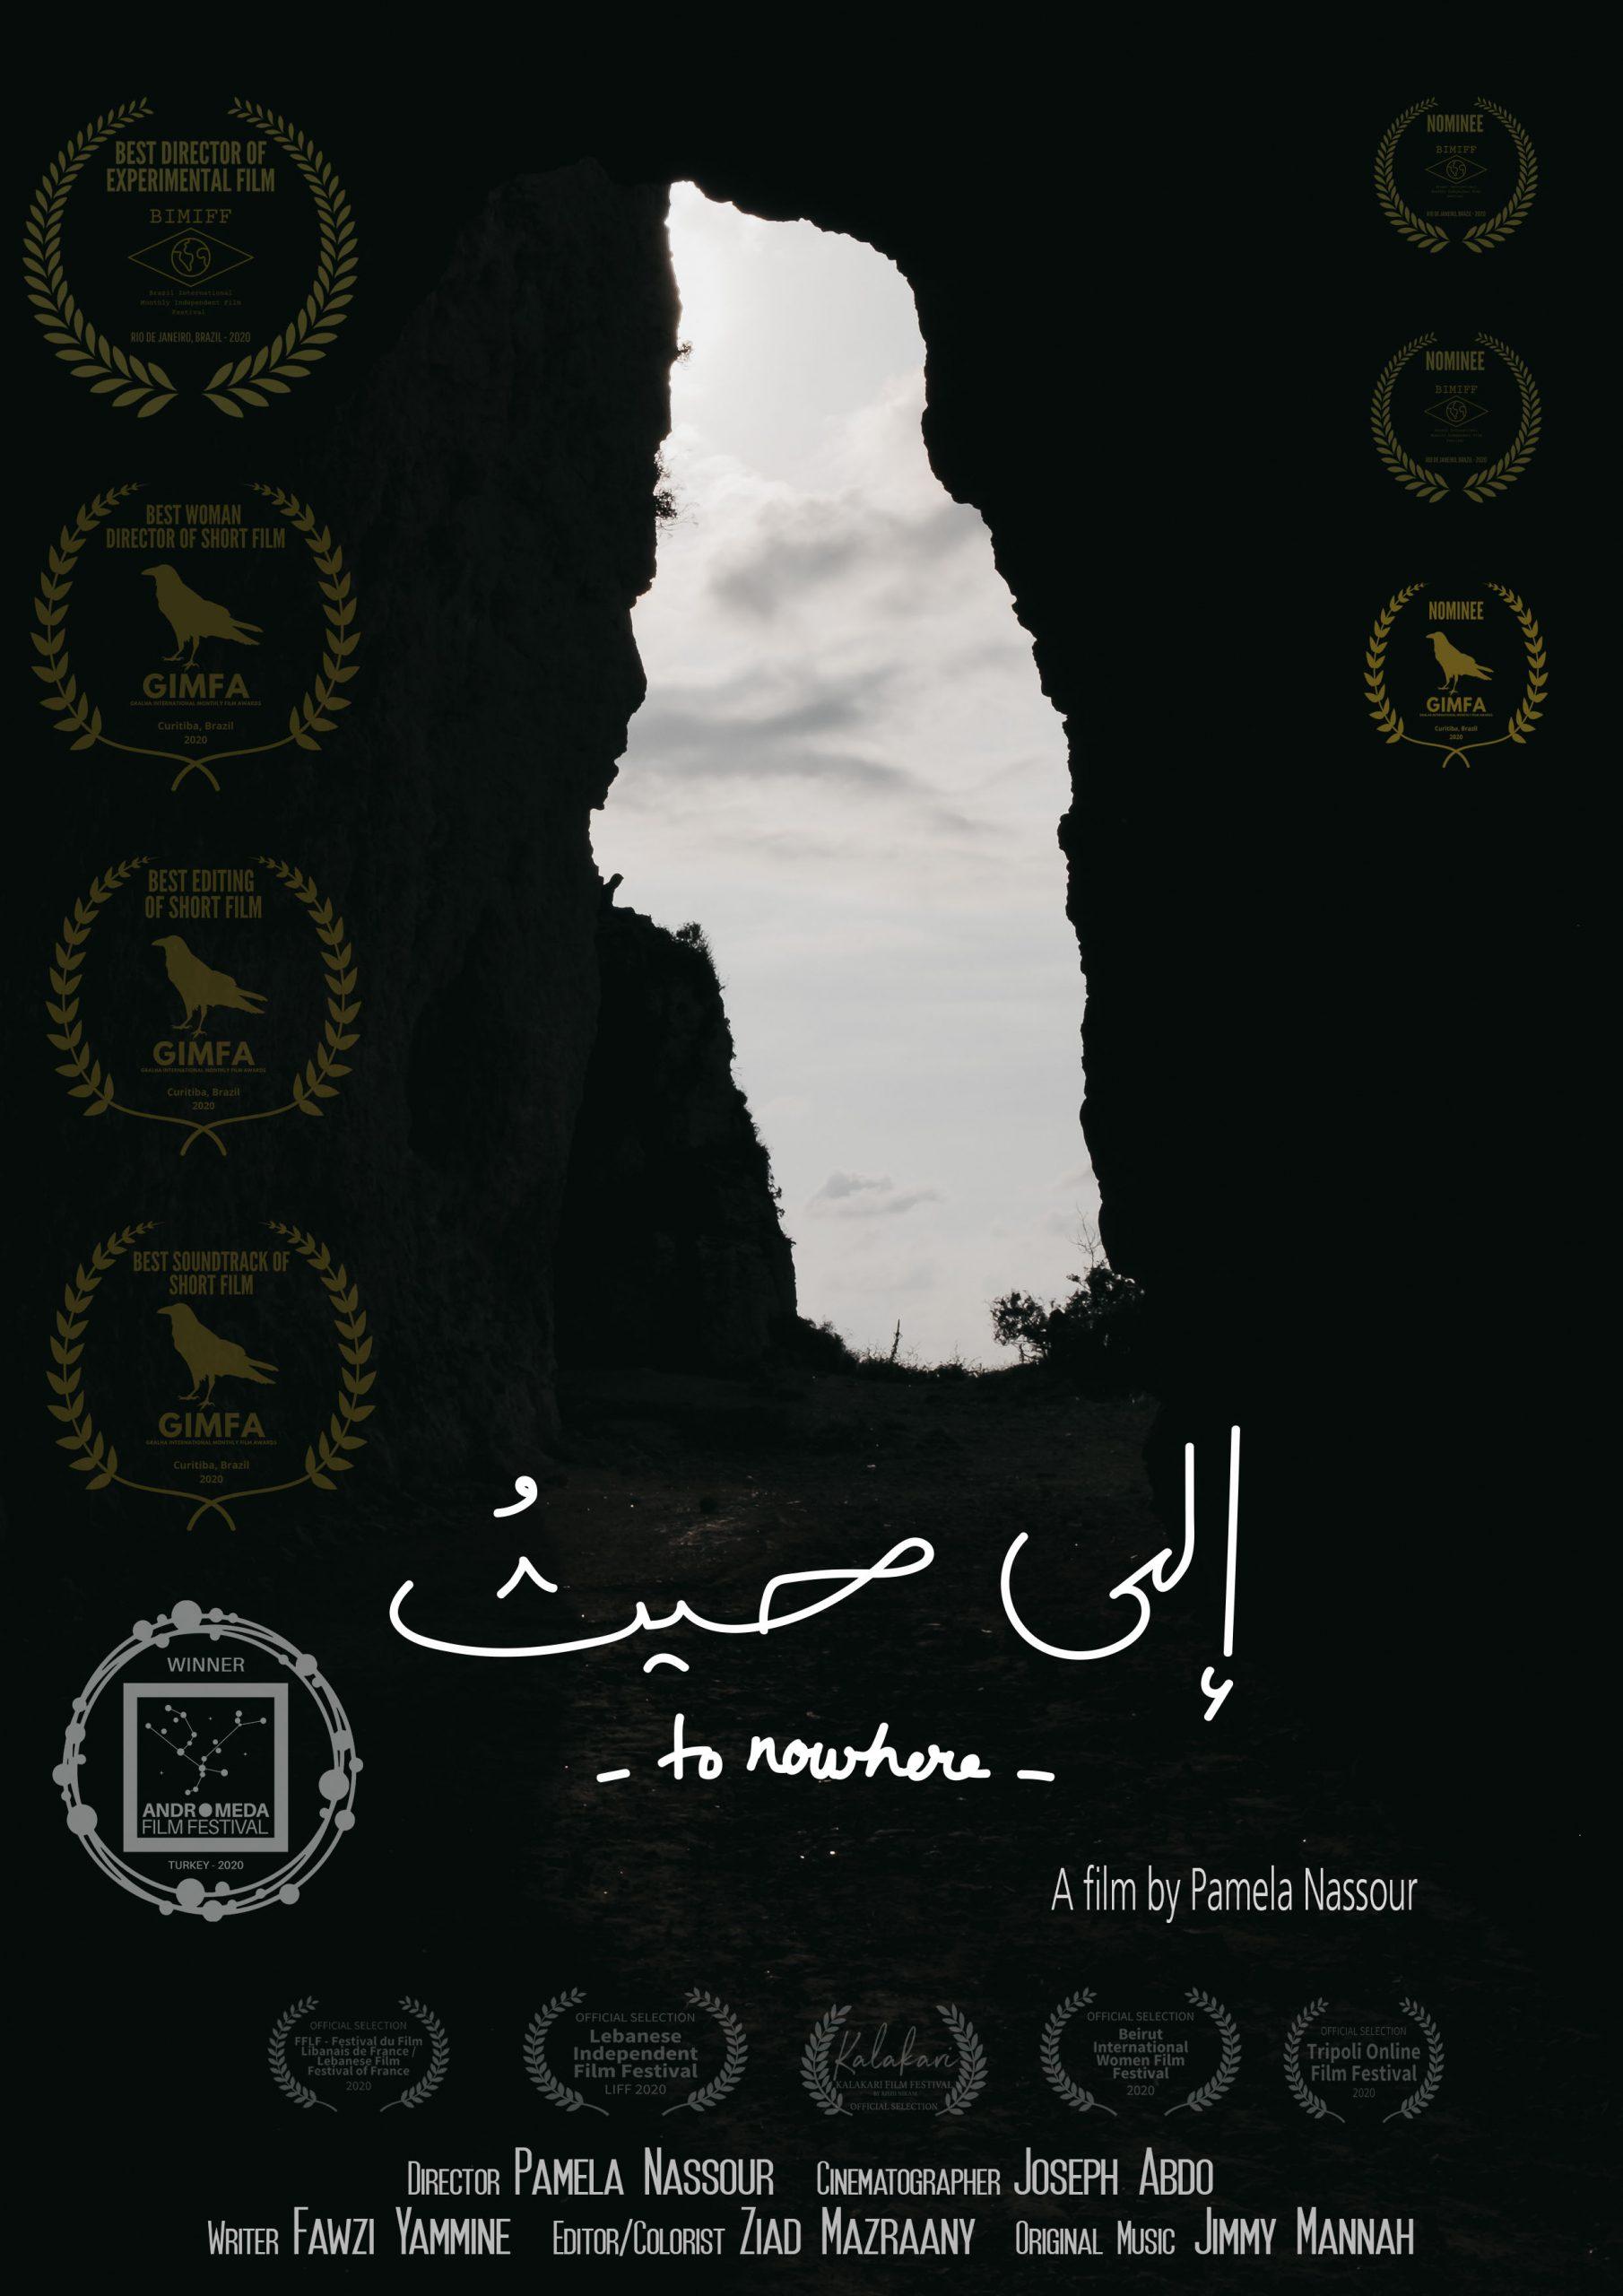 ila haythou NEW film poster.with laurels